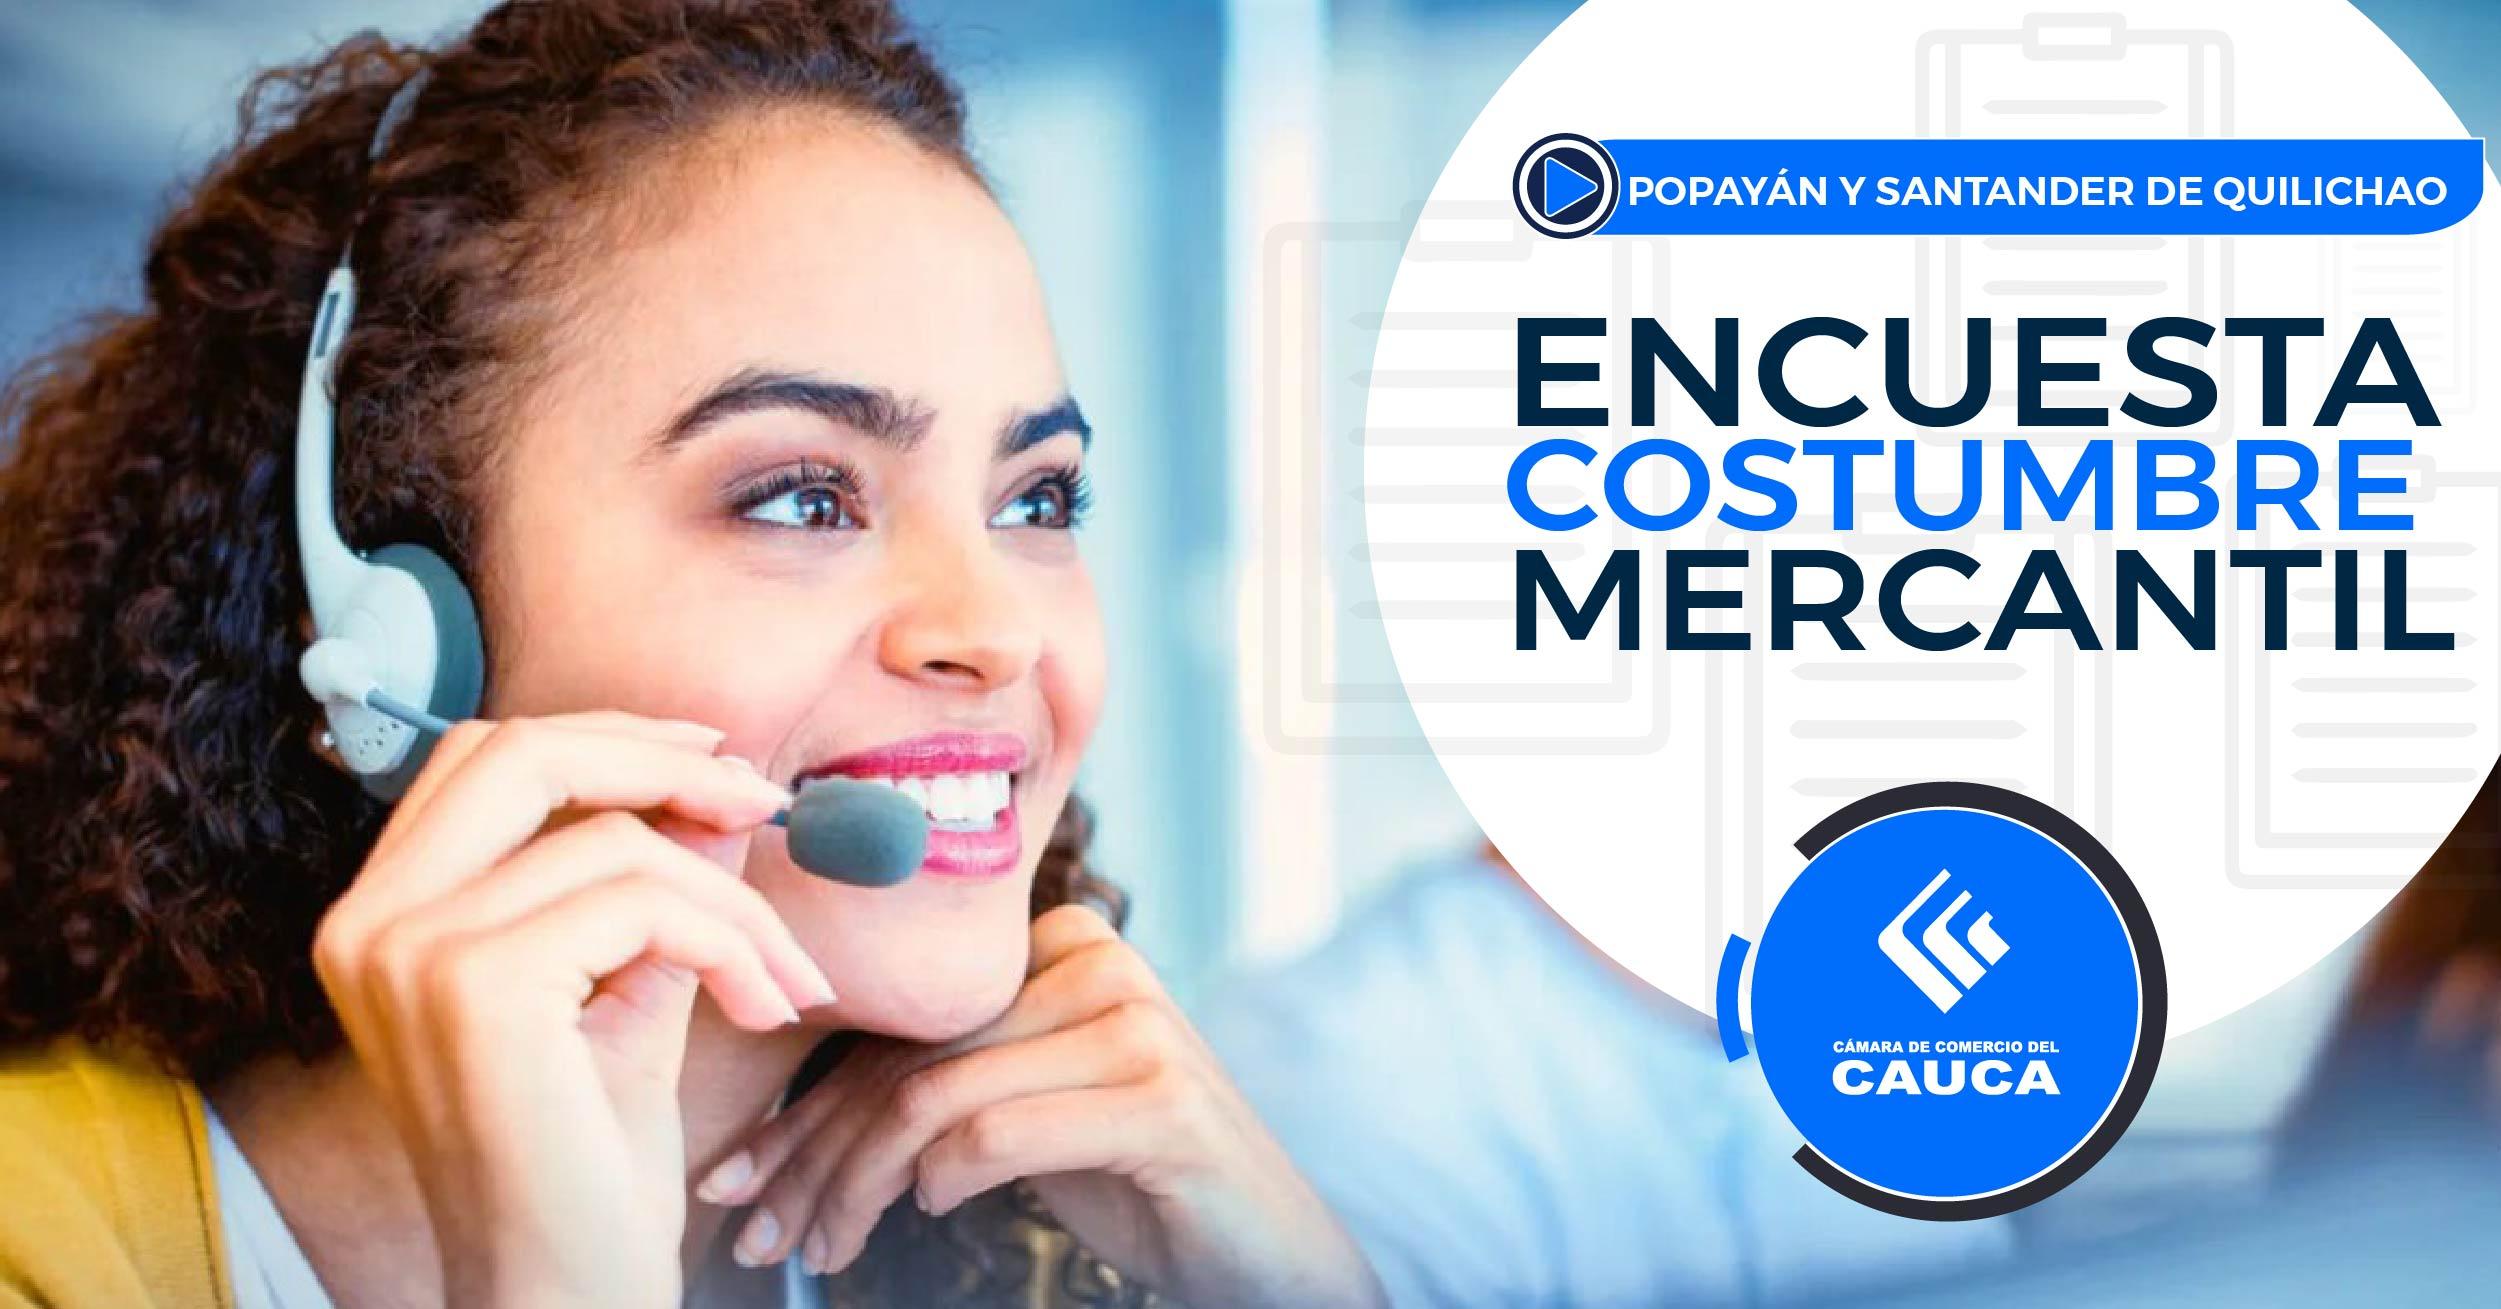 Encuesta: Costumbre Mercantil